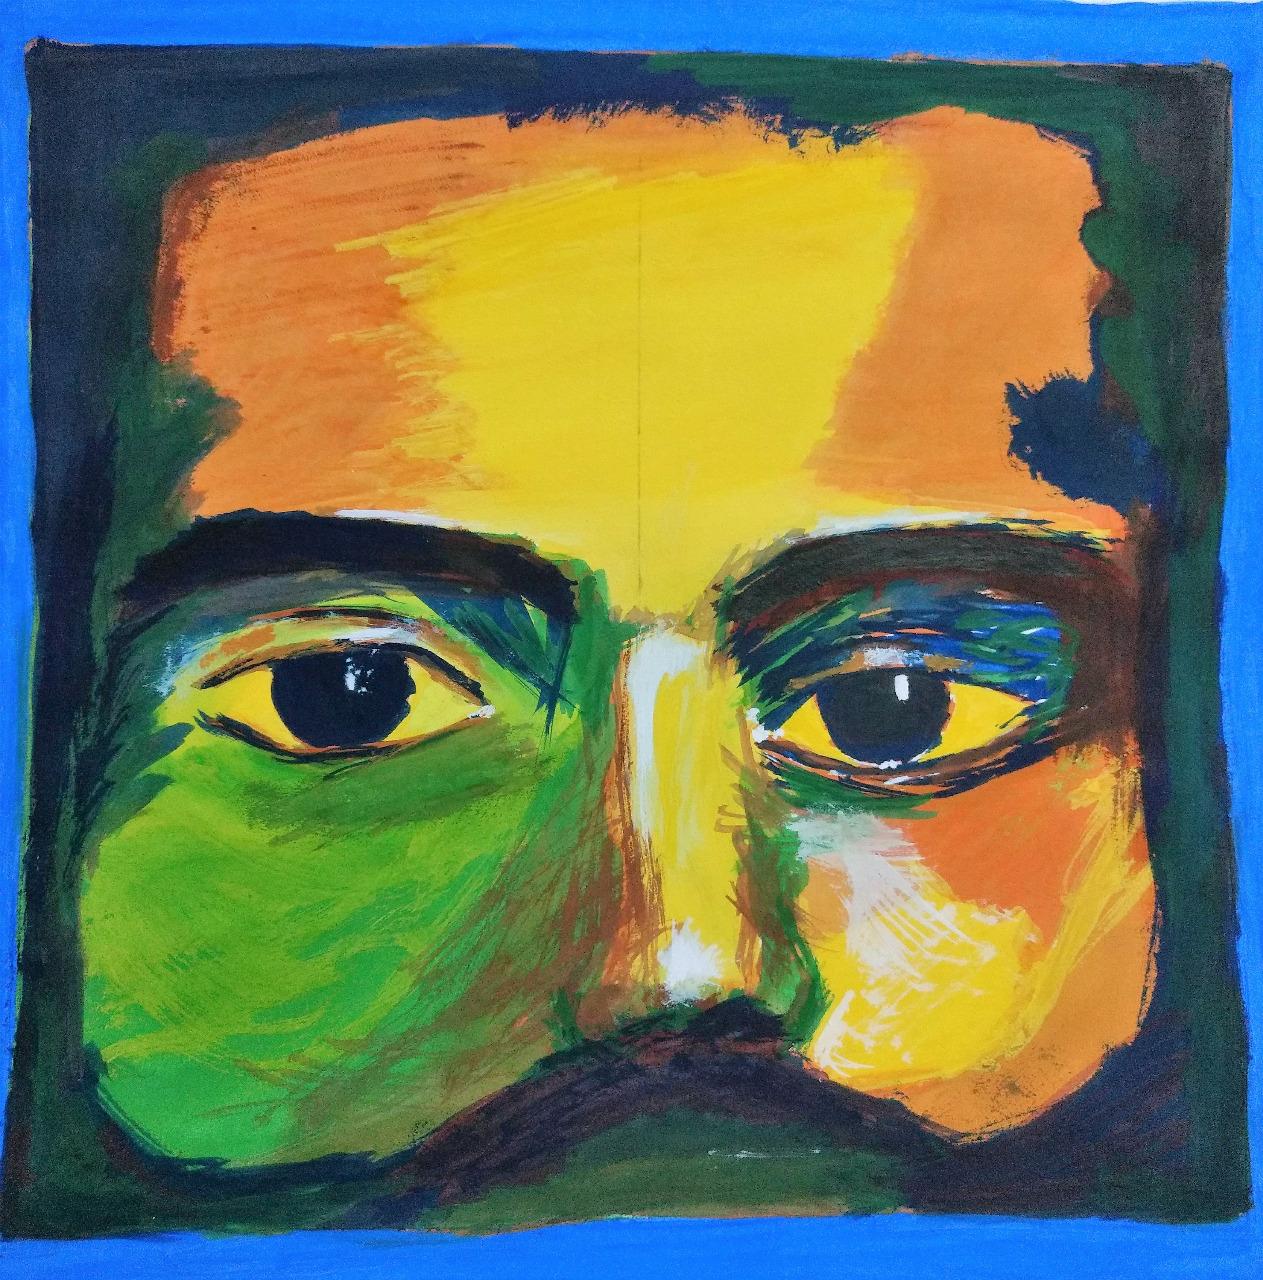 Bob Marley face painting by Ankita Pisat